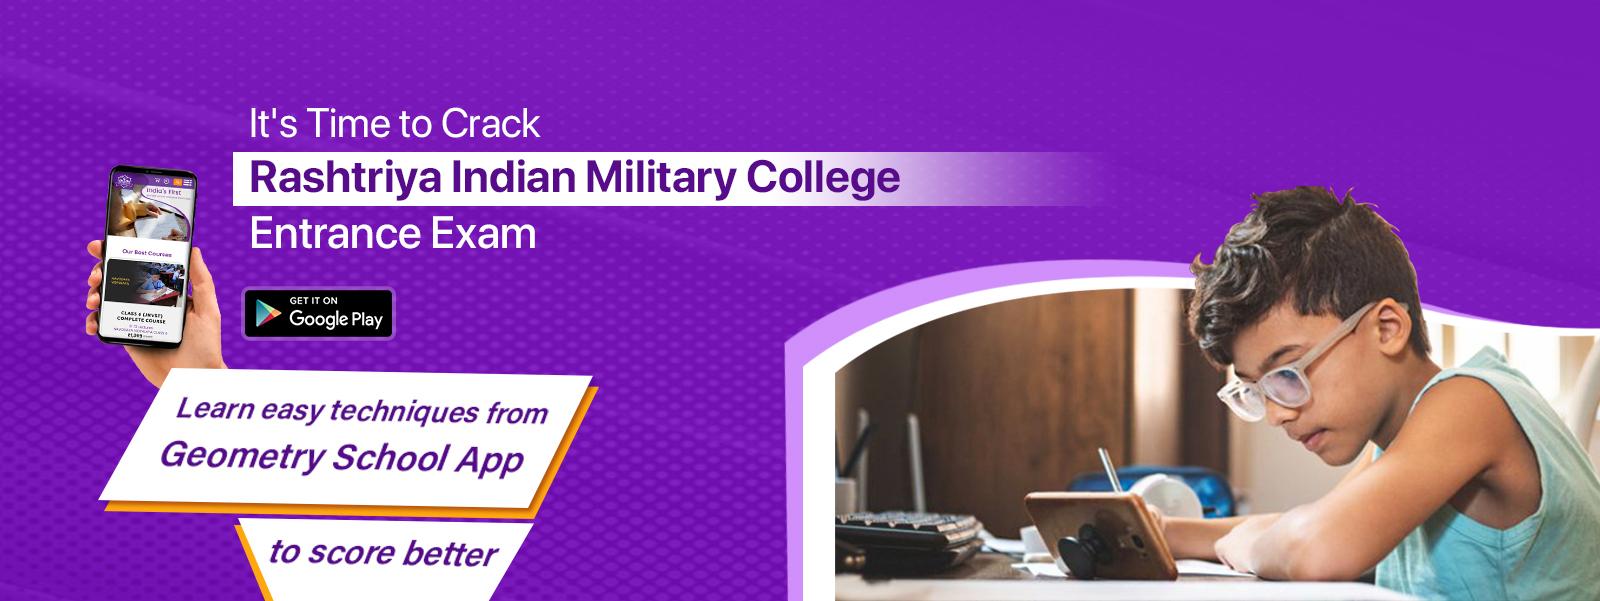 Rashtriya Indian Military College (RIMC) Entrance Exam